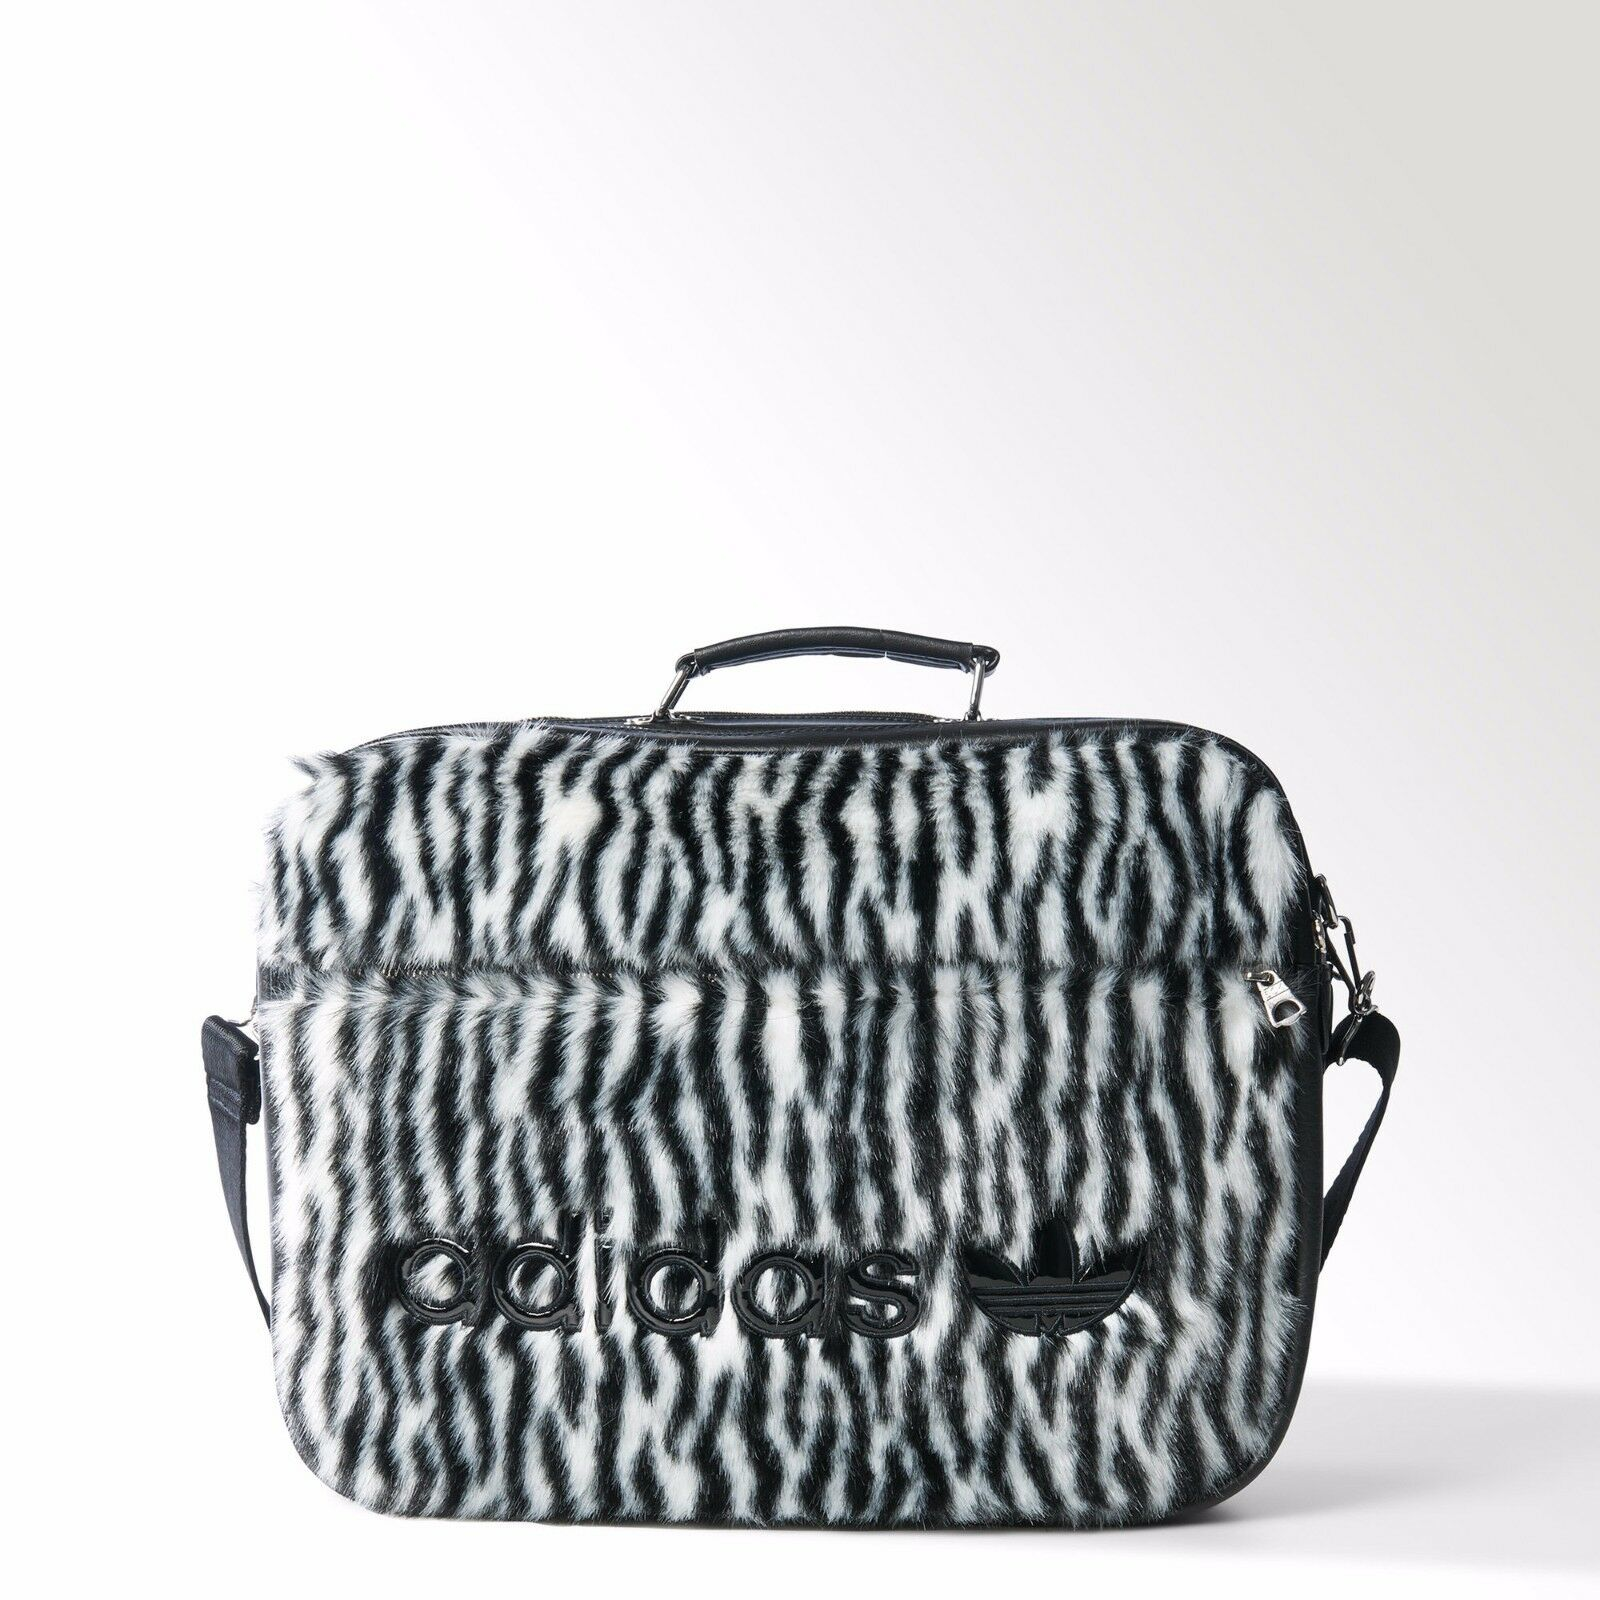 Adidas Originals Jeremy Scott Unisex Faux Hair Airliner Bag S19806